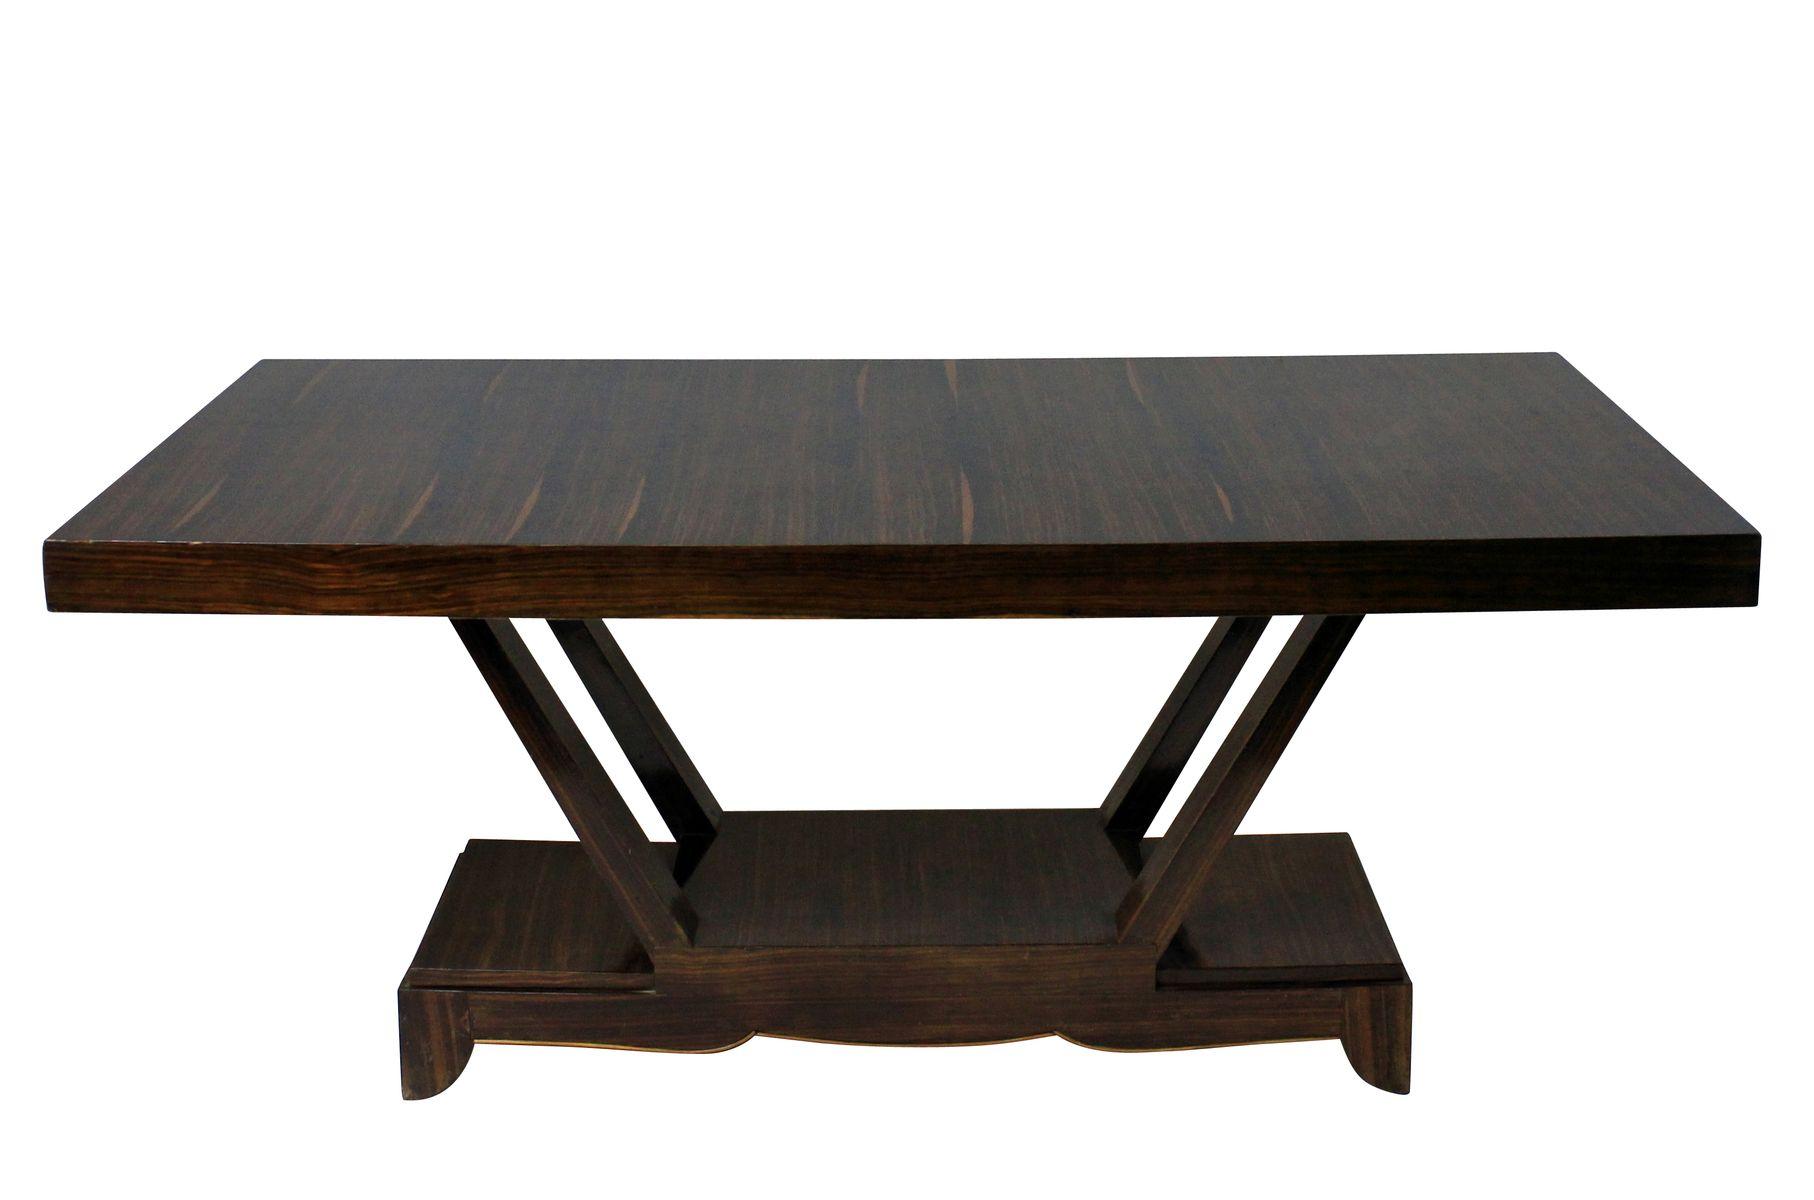 Vintage Italian Rosewood Dining Table for sale at Pamono : vintage italian rosewood dining table 2 from www.pamono.com.au size 1814 x 1200 jpeg 75kB